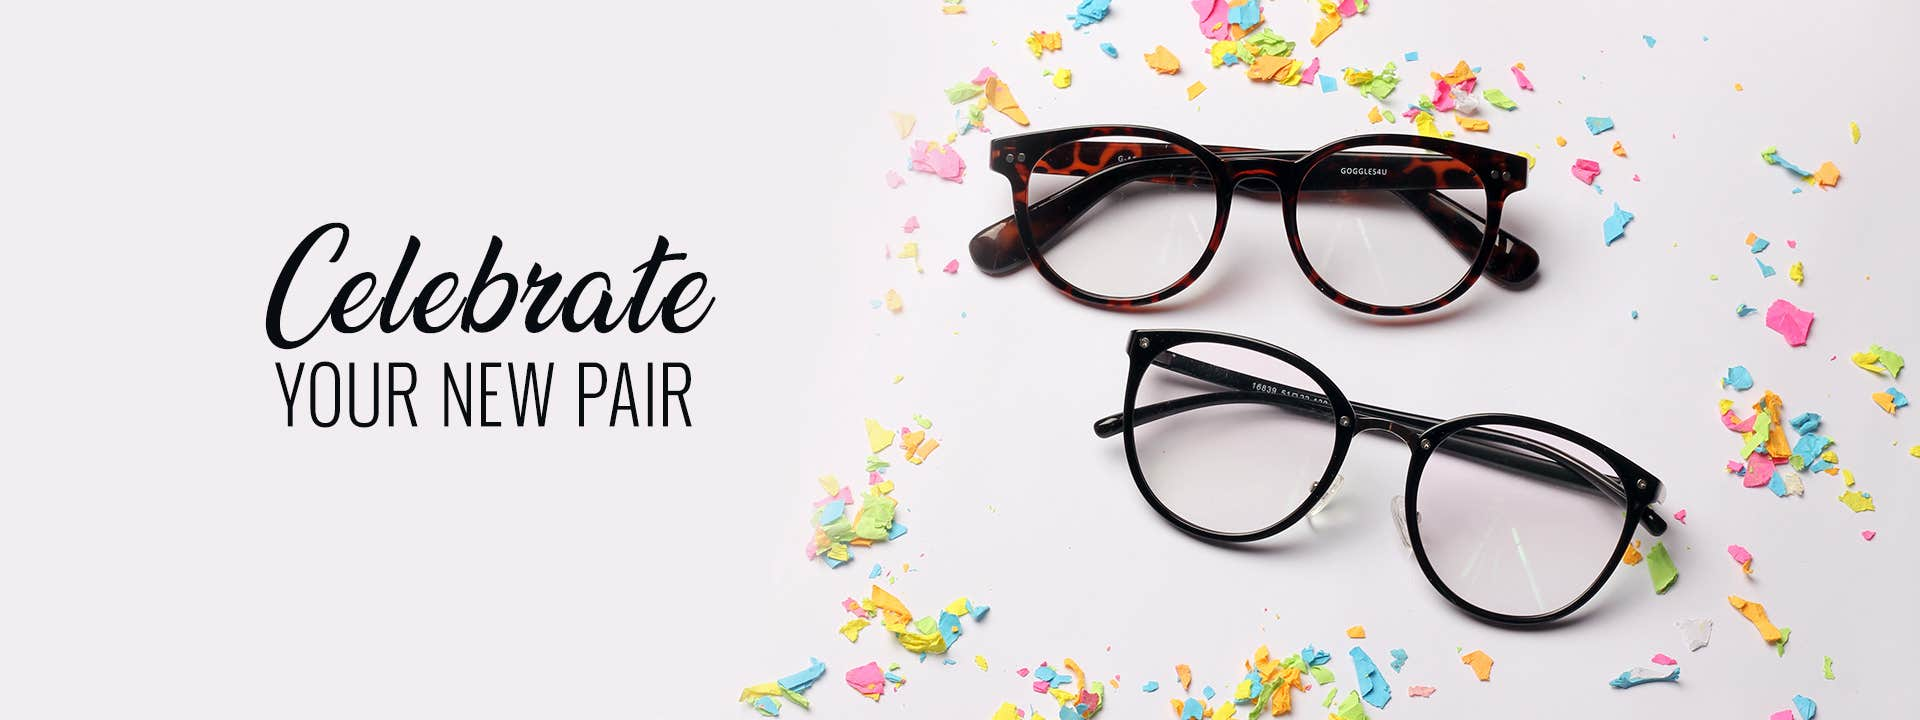 Buy Glasses at Eyeglasses PK